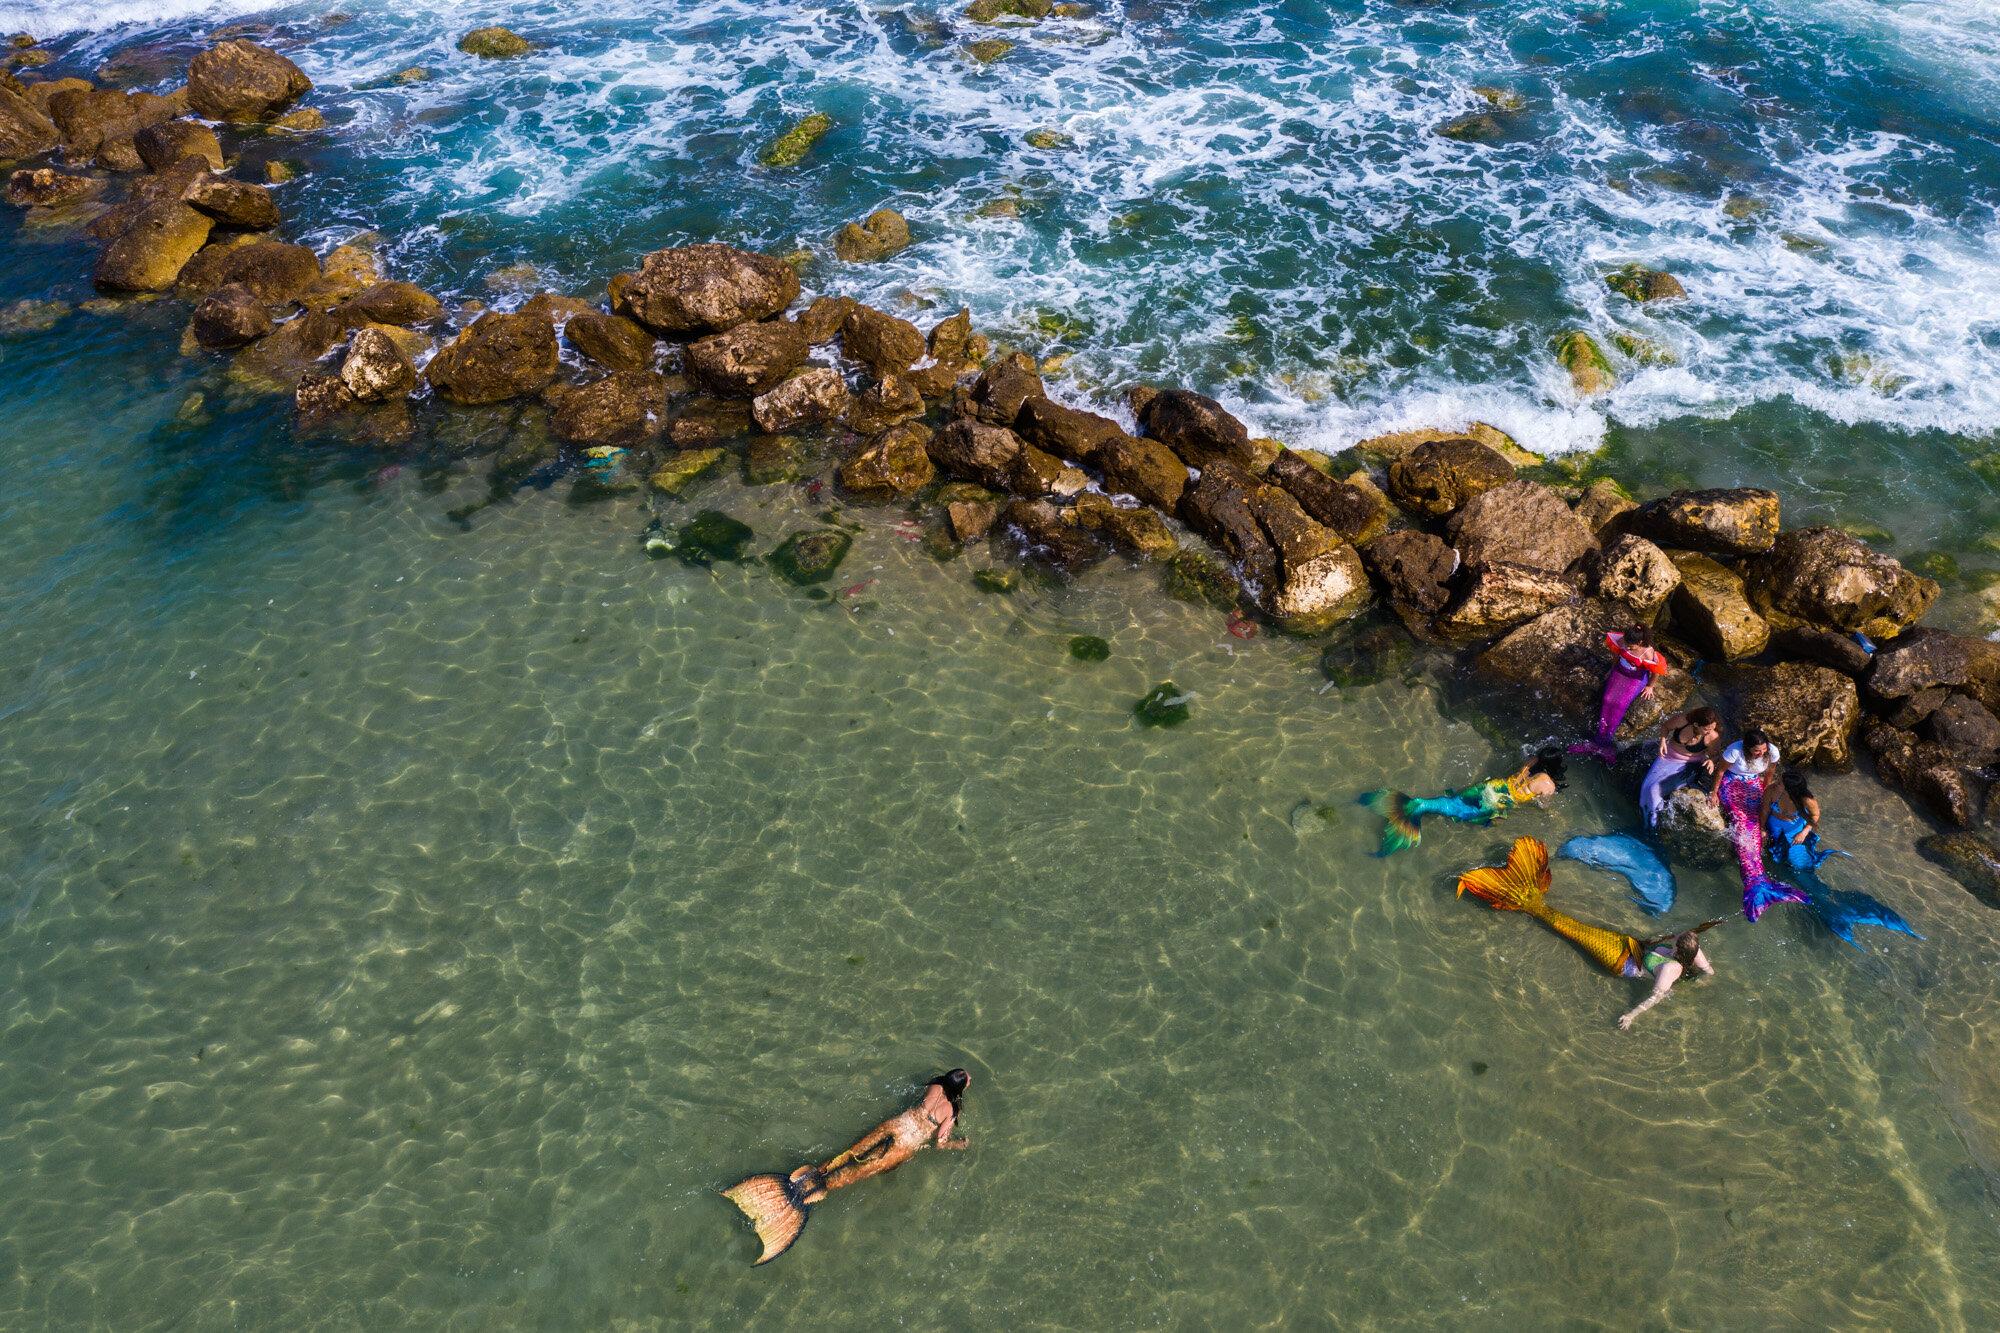 Members of the Israeli Mermaid Community swim with mermaid tails at the beachfront in Bat Yam, near Tel Aviv, Israel, on May 23, 2020. (AP Photo/Oded Balilty)